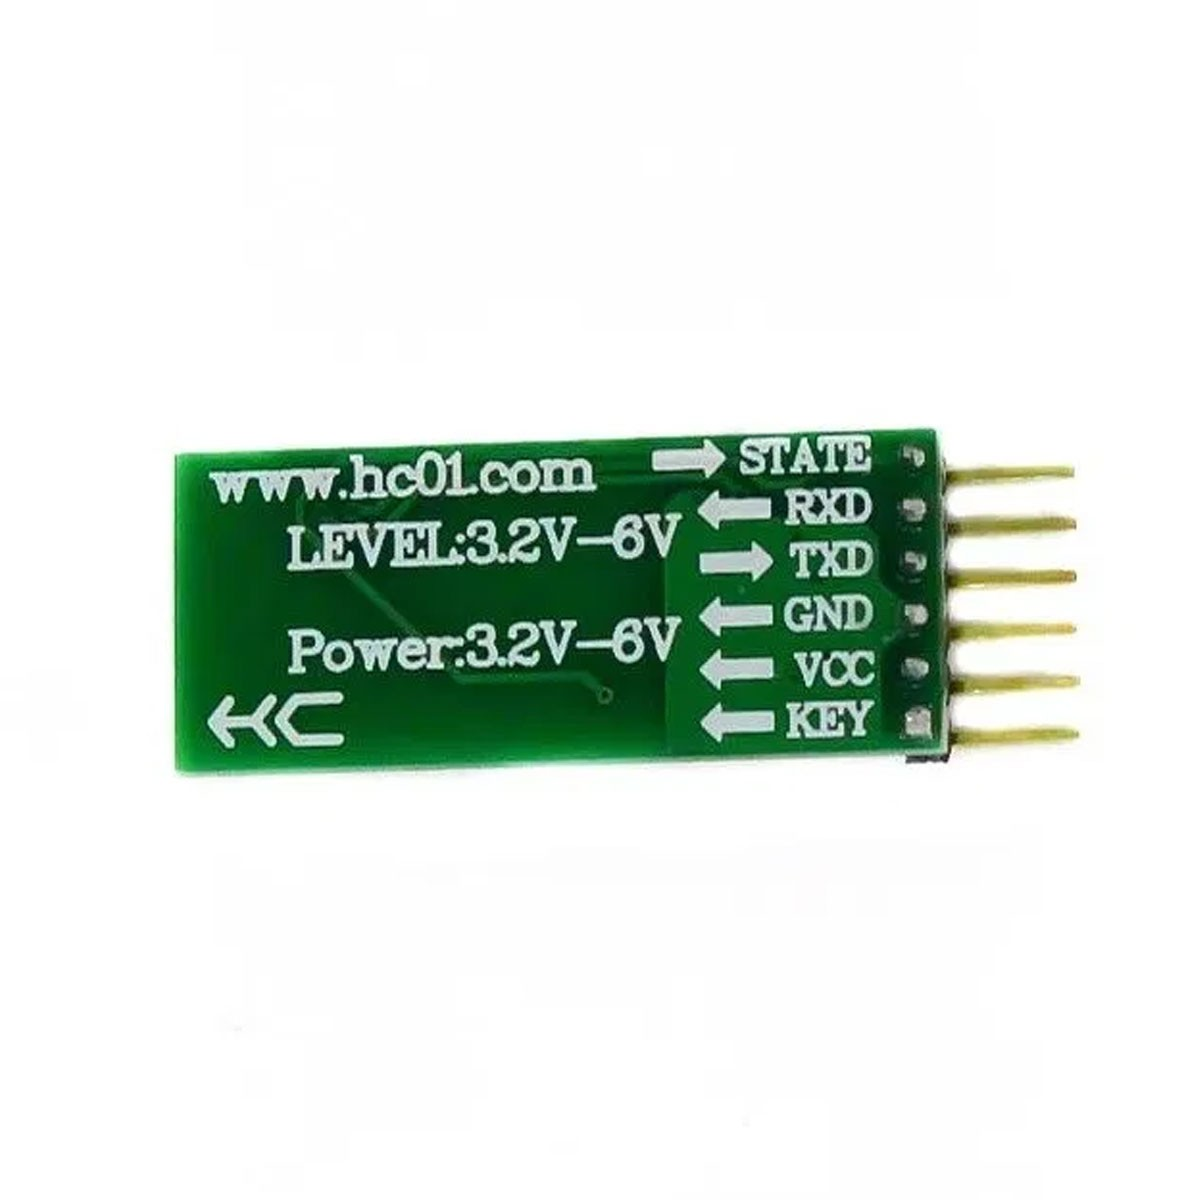 Módulo Bluetooth HC-08 4.0 BLE Arduino para iPhone e iPad - Master/Slave